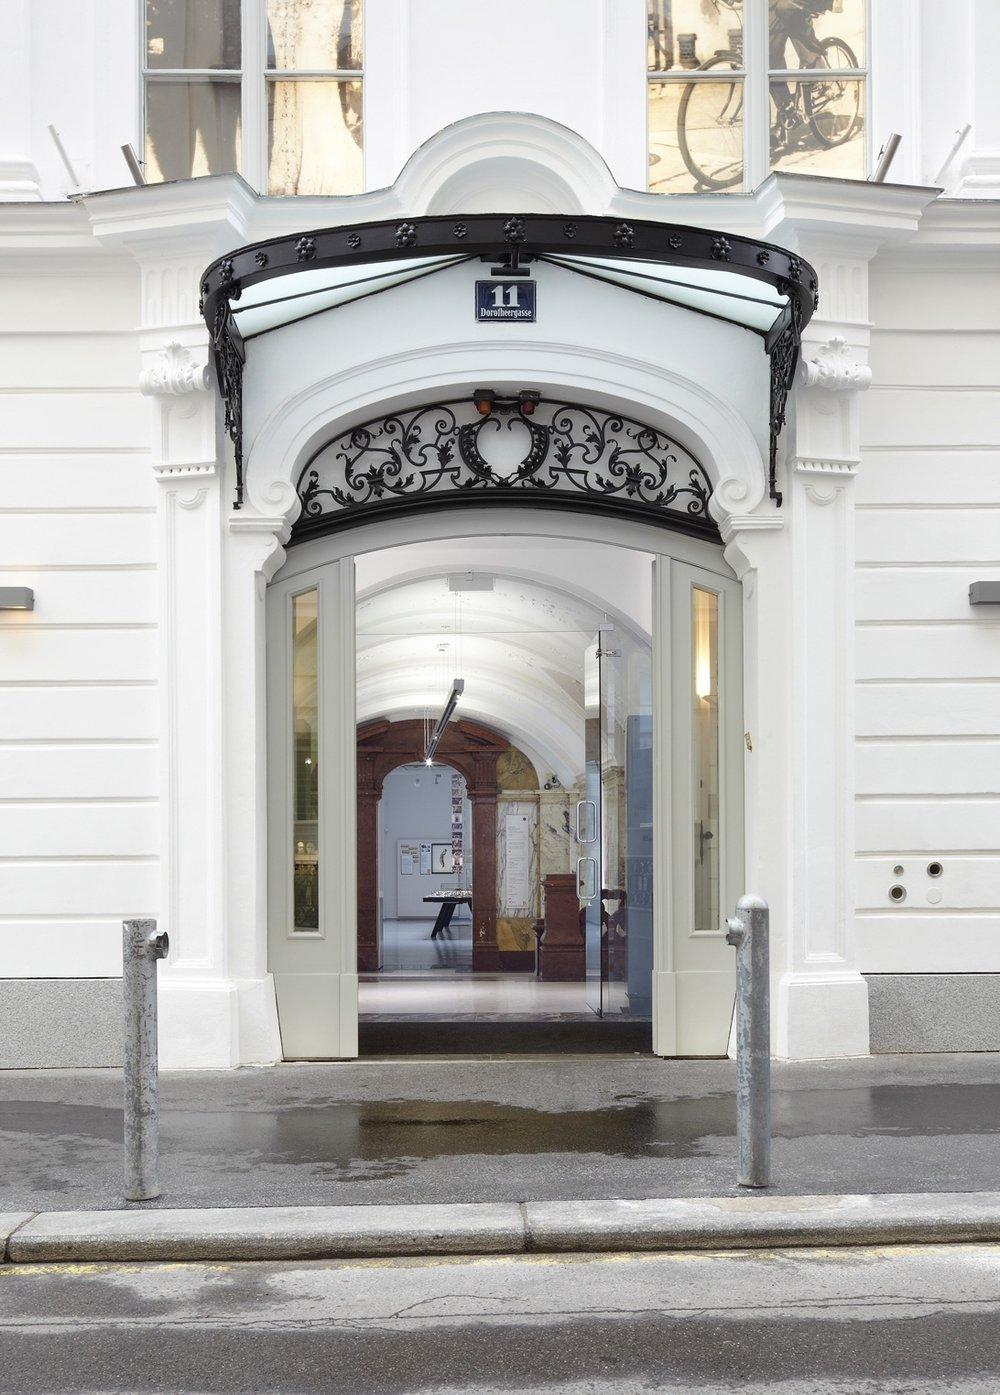 A01 architects - Jewish Museum Vienna_(c)Philipp Kreidl_111020_MG_8278_e__web01.jpg